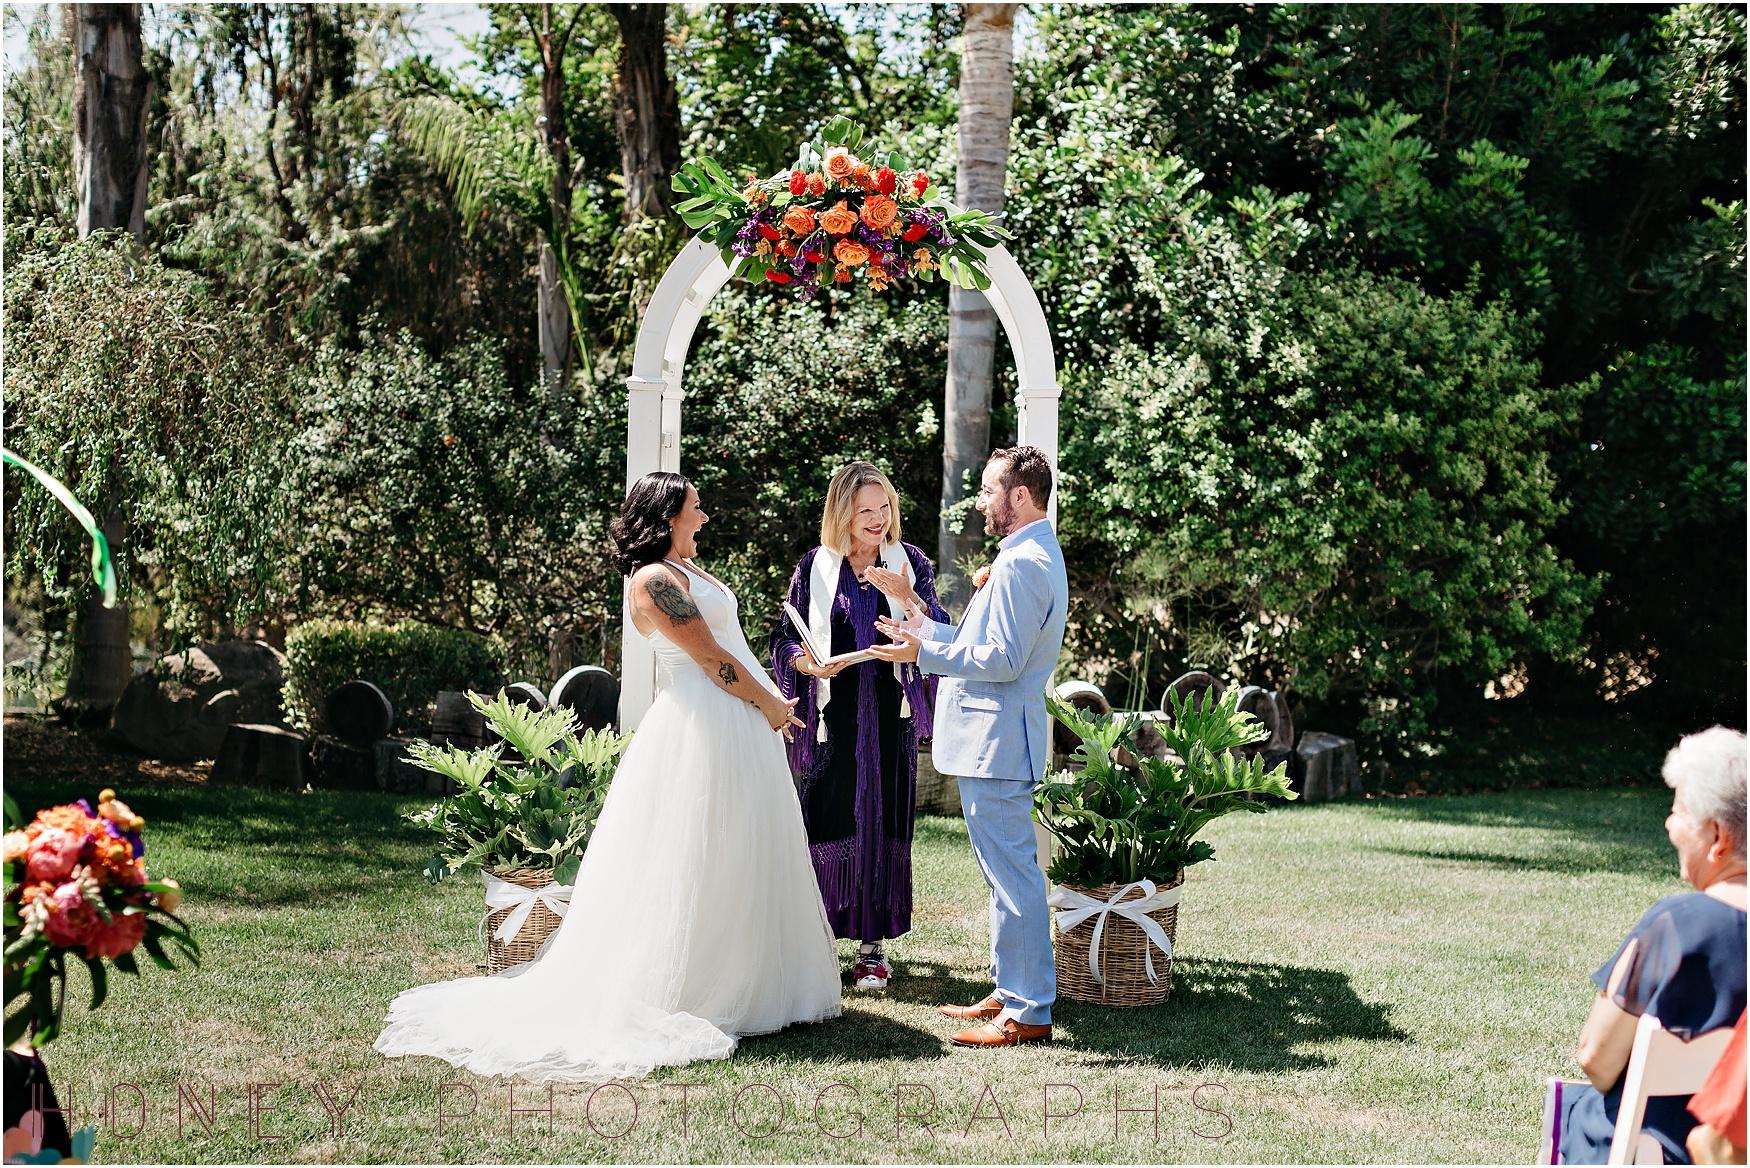 colorful_ecclectic_vibrant_vista_rainbow_quirky_wedding021.jpg